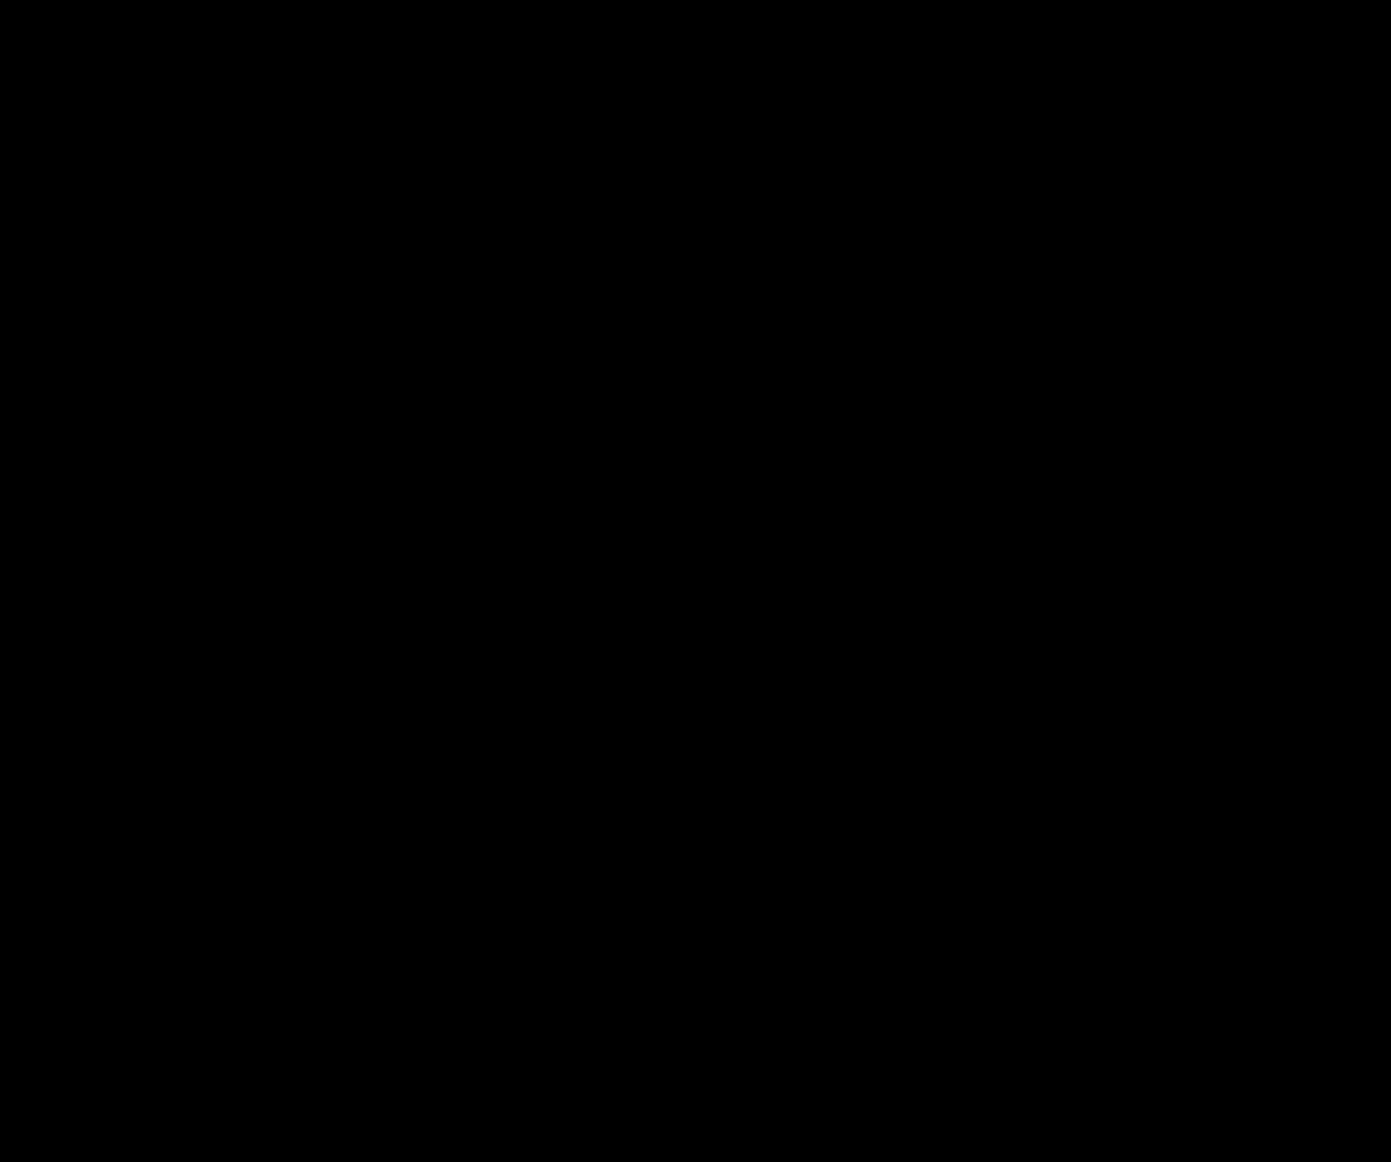 Голова орла - рисунок вектор